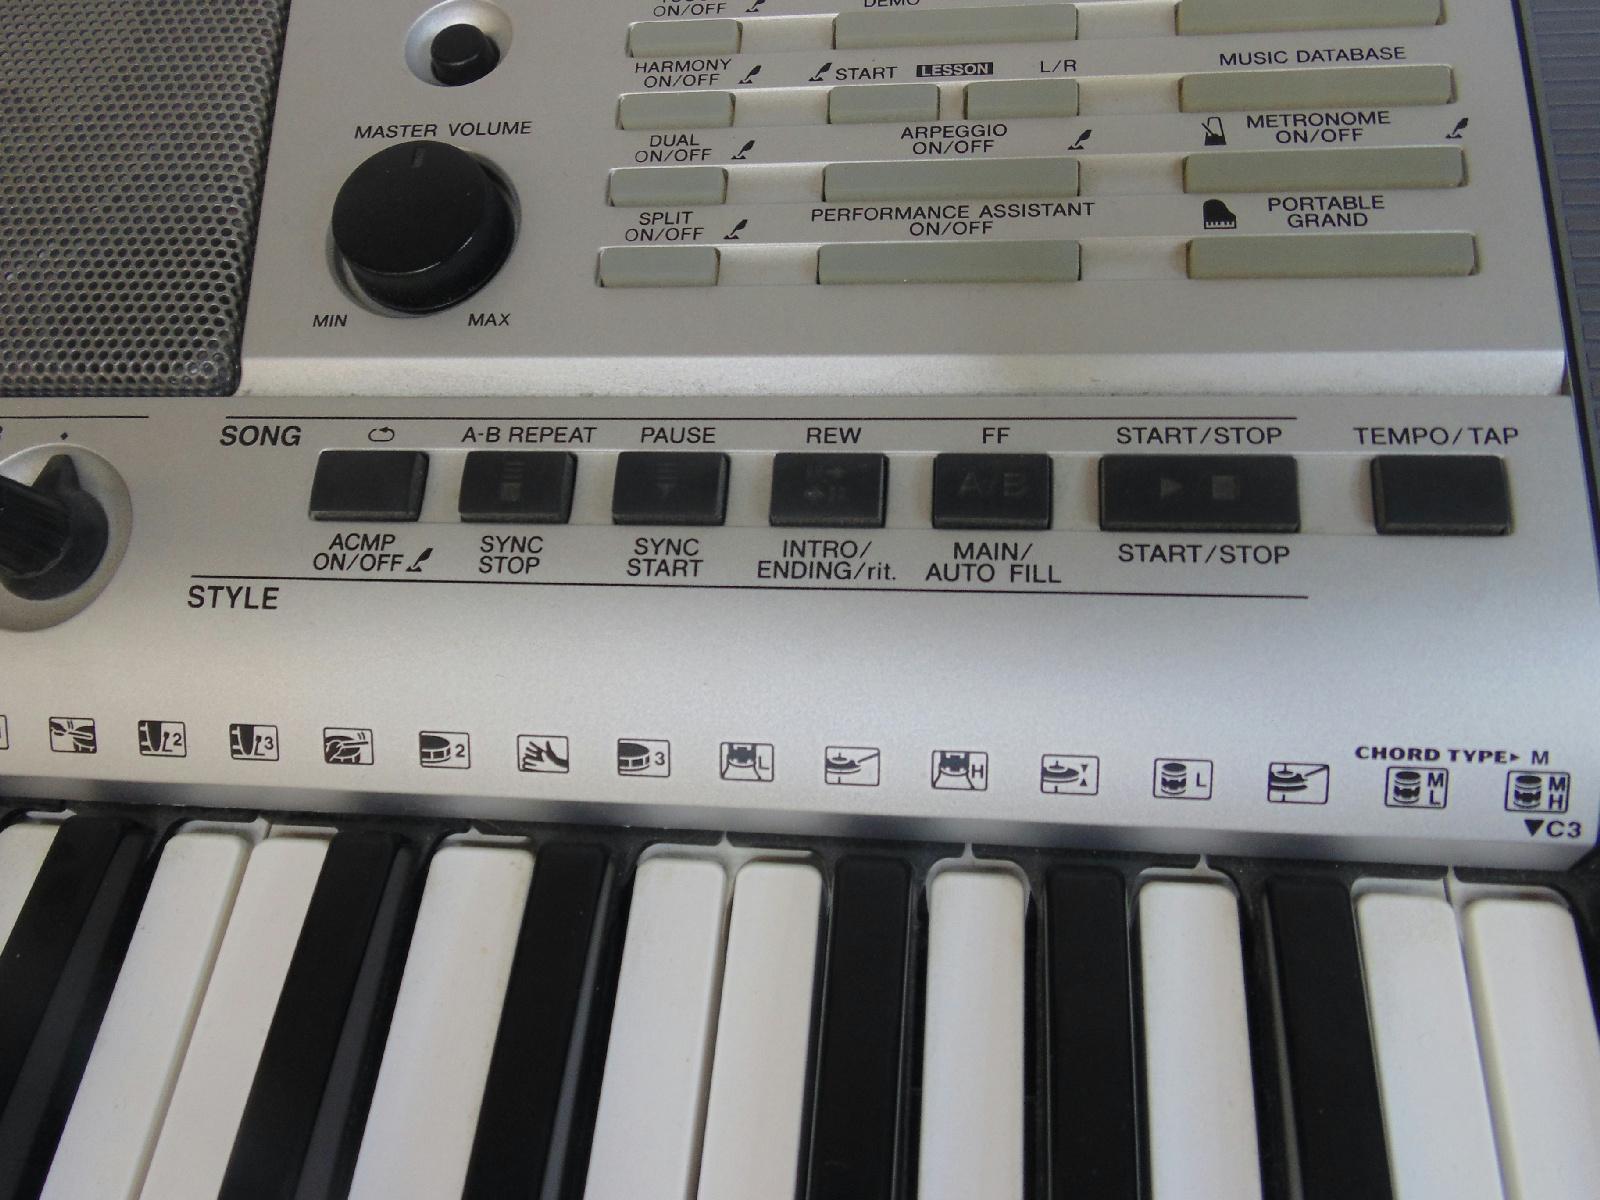 yamaha electronic portable keyboard psr e403 5 octaves. Black Bedroom Furniture Sets. Home Design Ideas